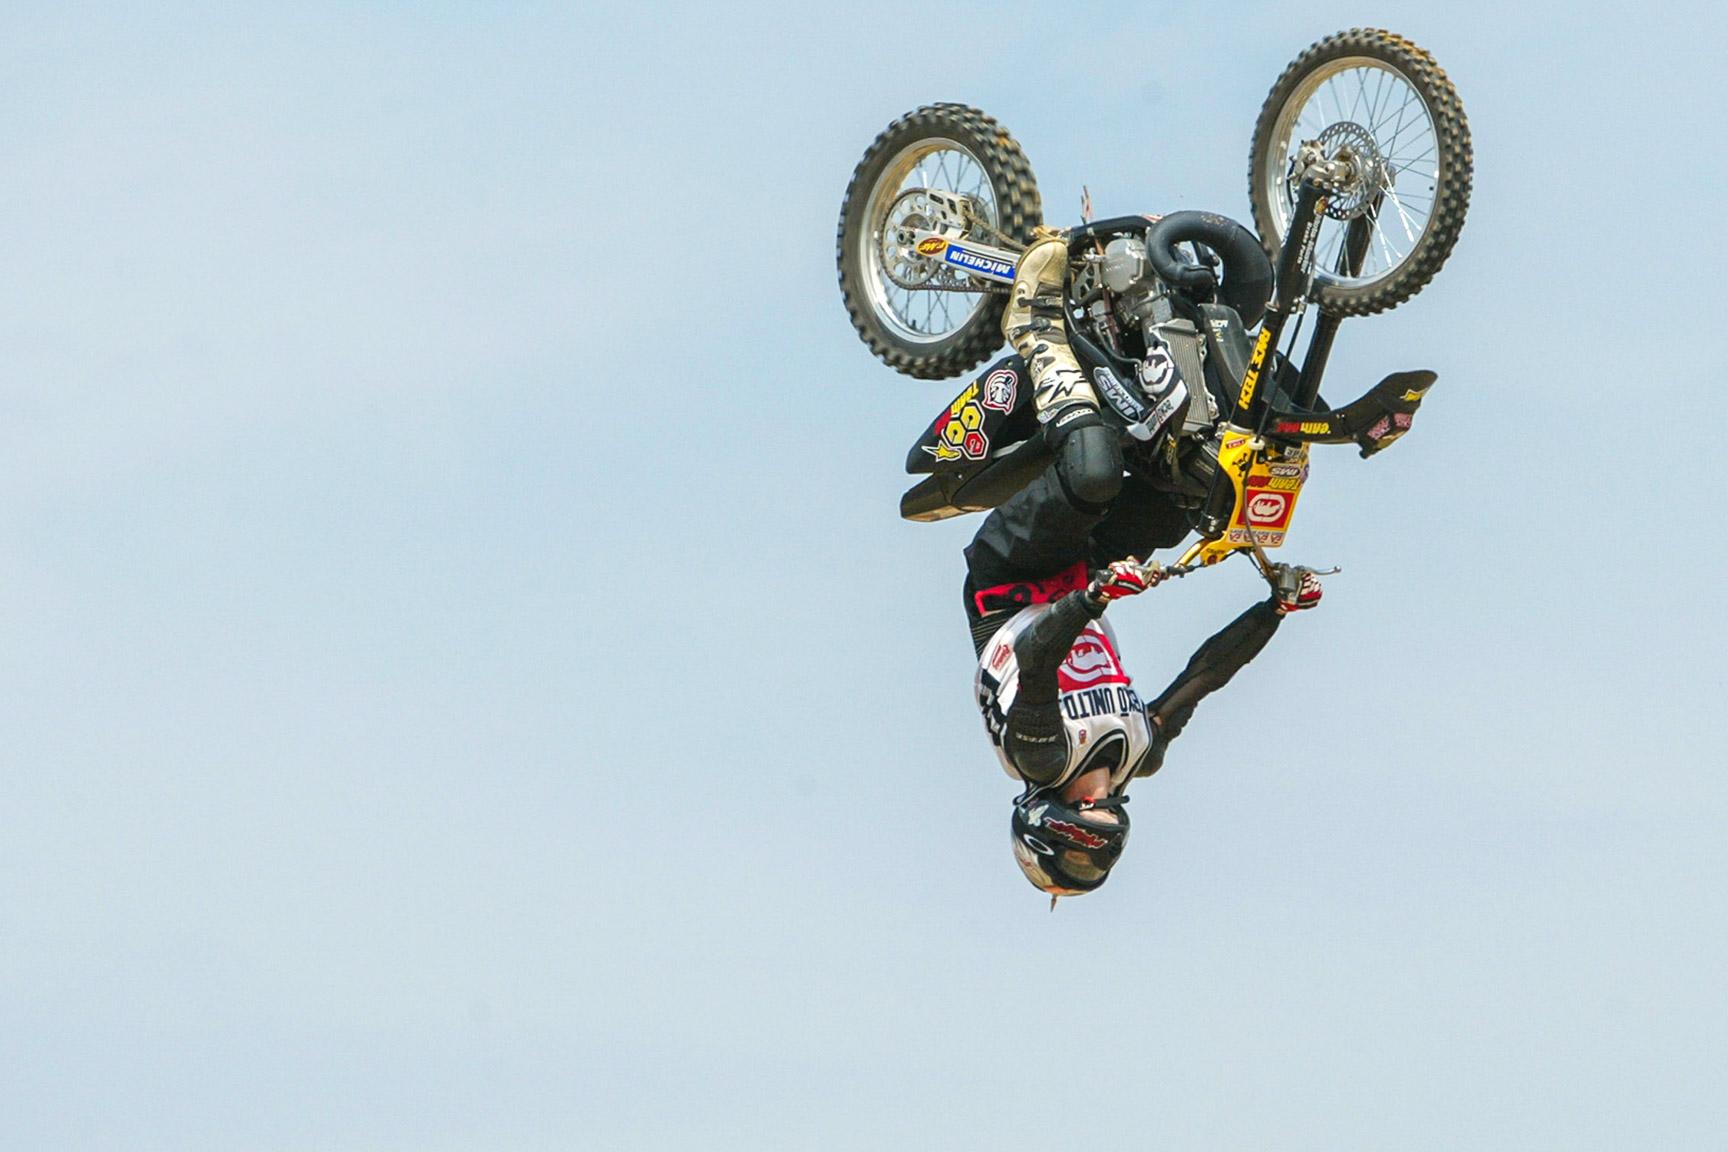 #6 Mike Metzger: Moto X Backflip